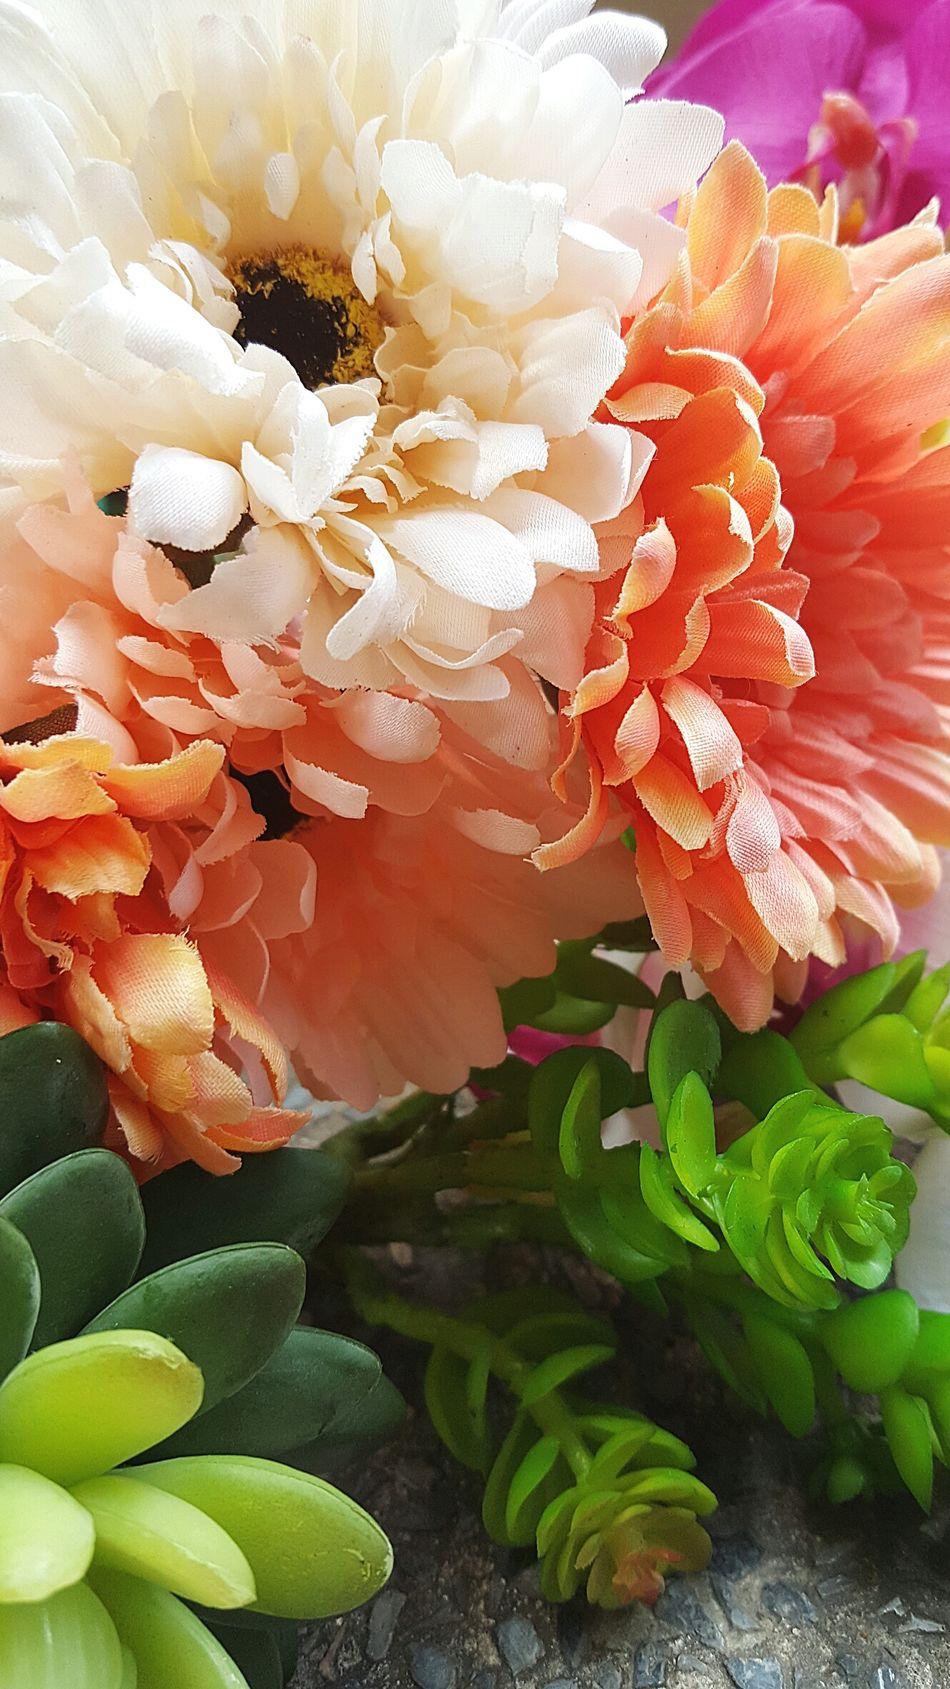 Artificial Flower Artificial Flowers Artificialflowerbouquet Artificialflowers Artificialflower Artificial Flower Lover Artificial Flower Bouquet Flowerlovers Flowerlover